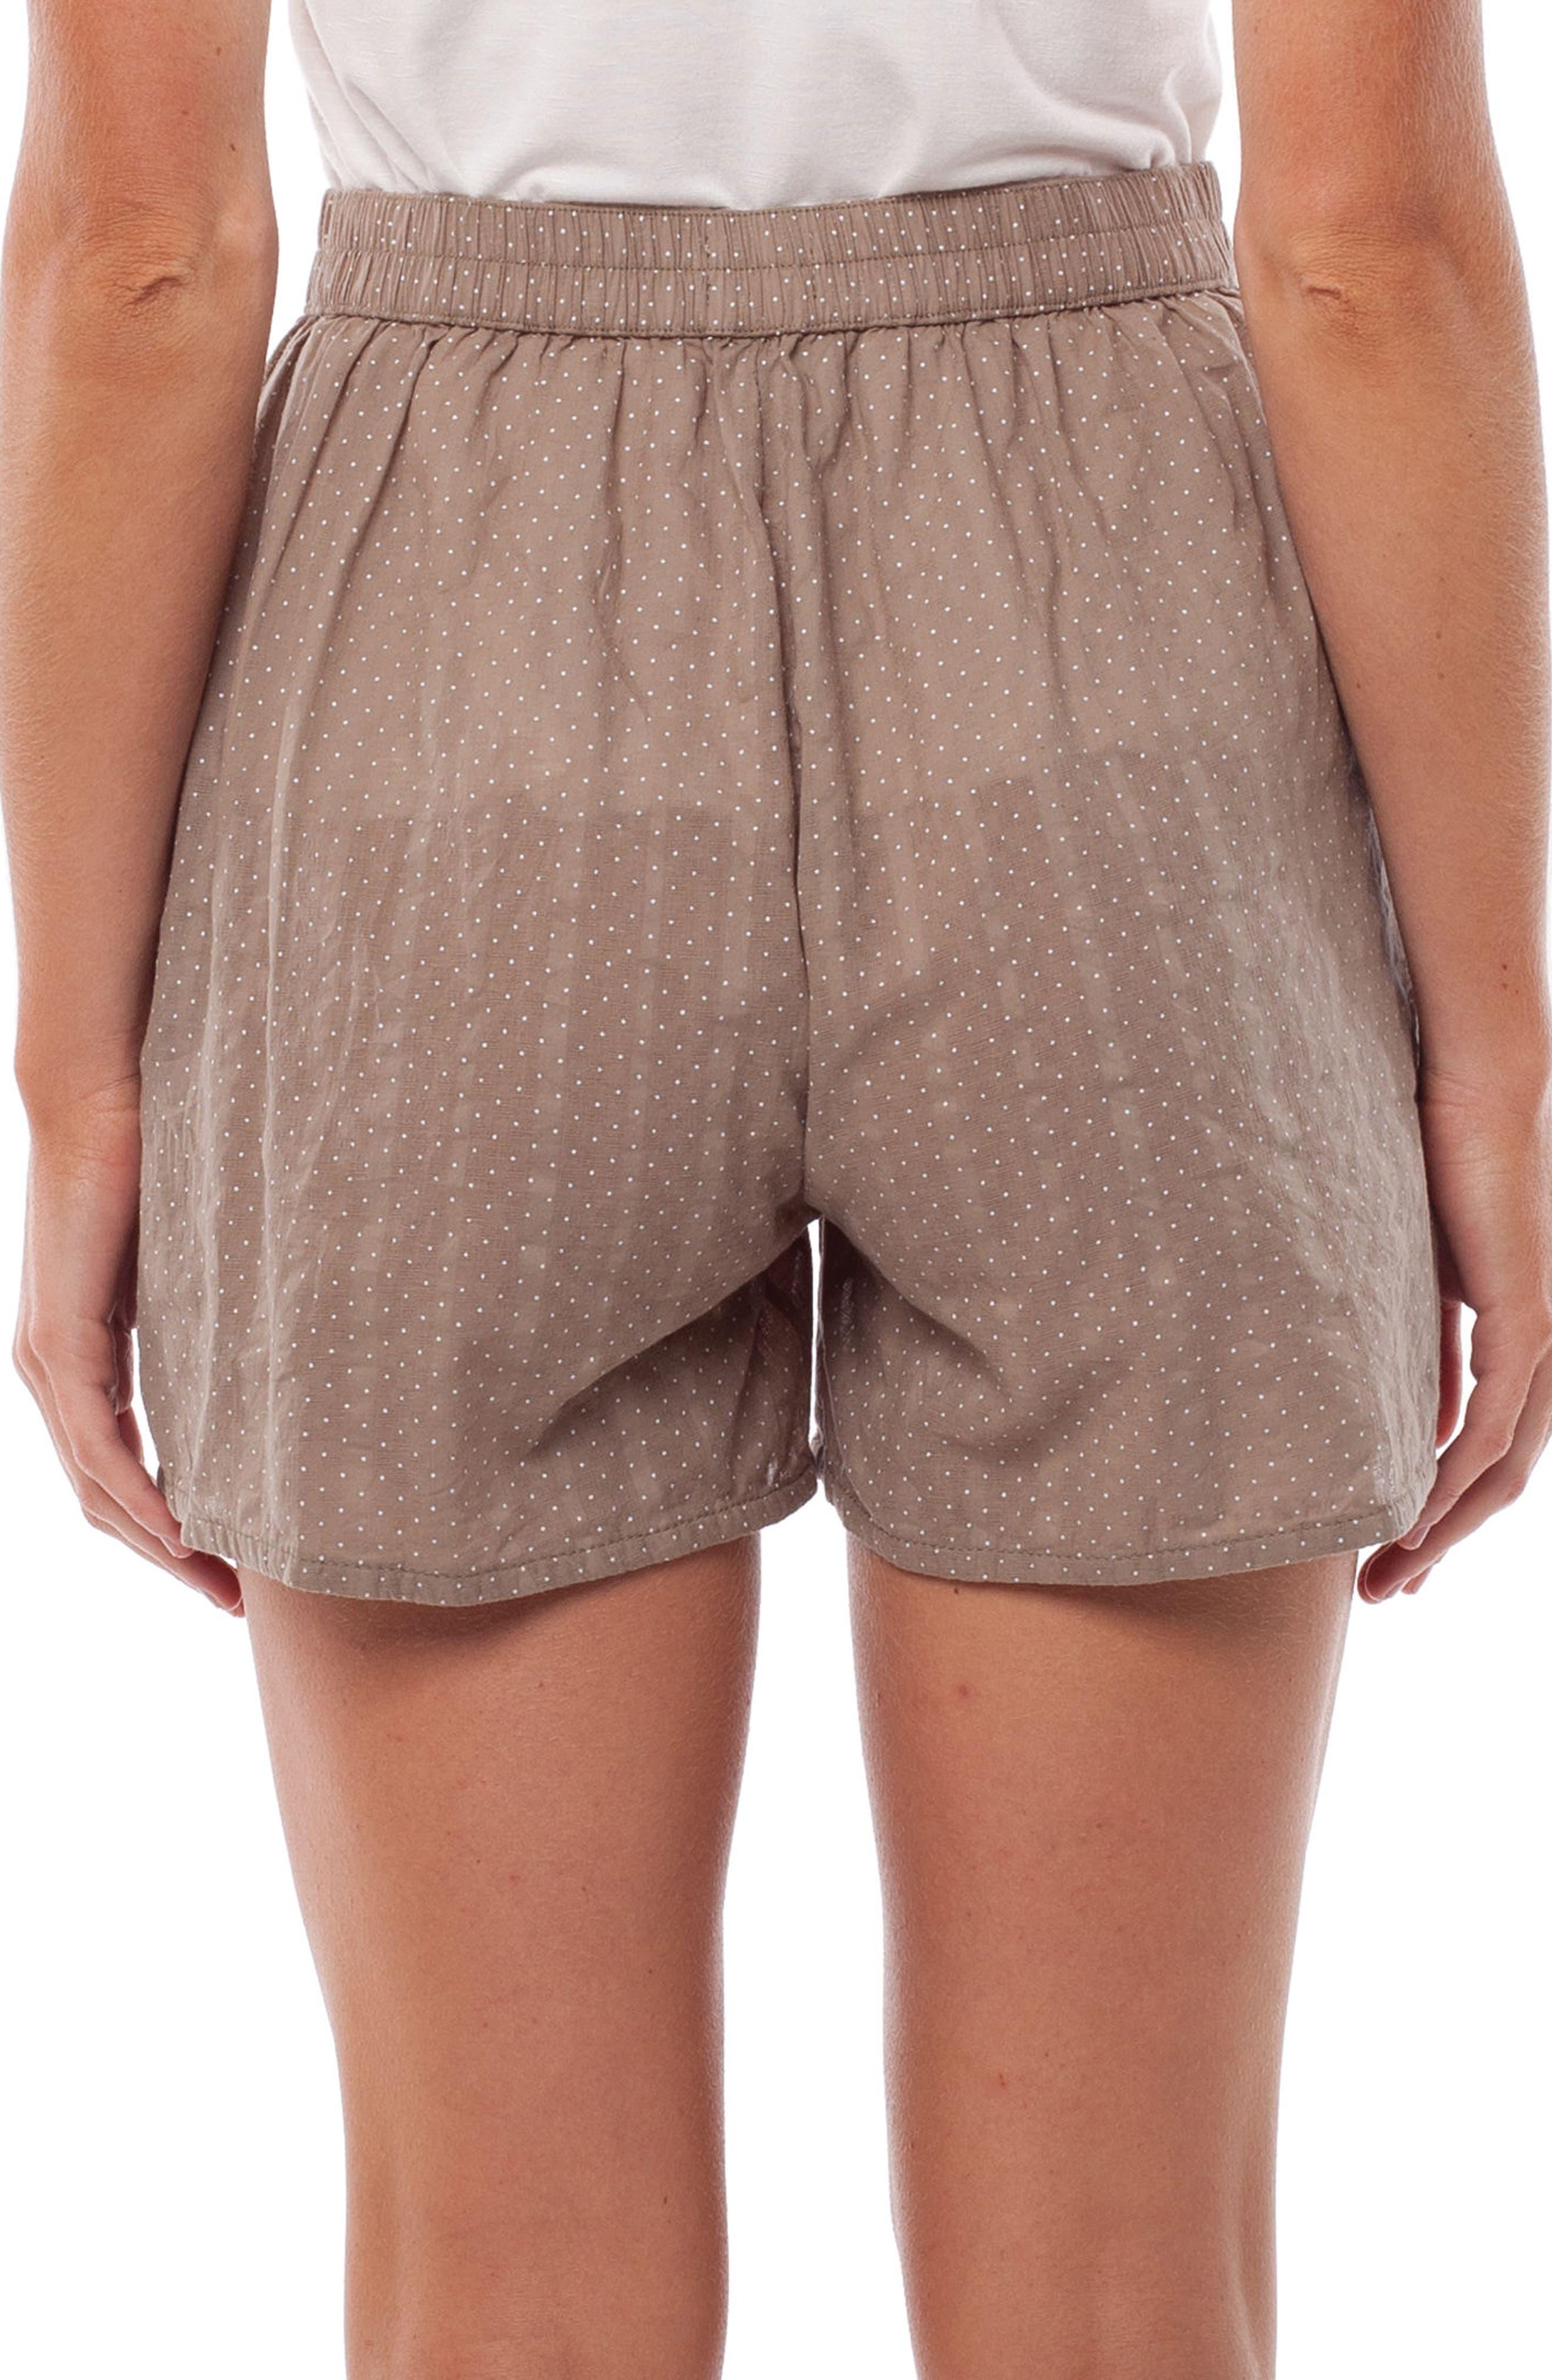 Messina Cover-Up Shorts,                             Alternate thumbnail 2, color,                             Chai